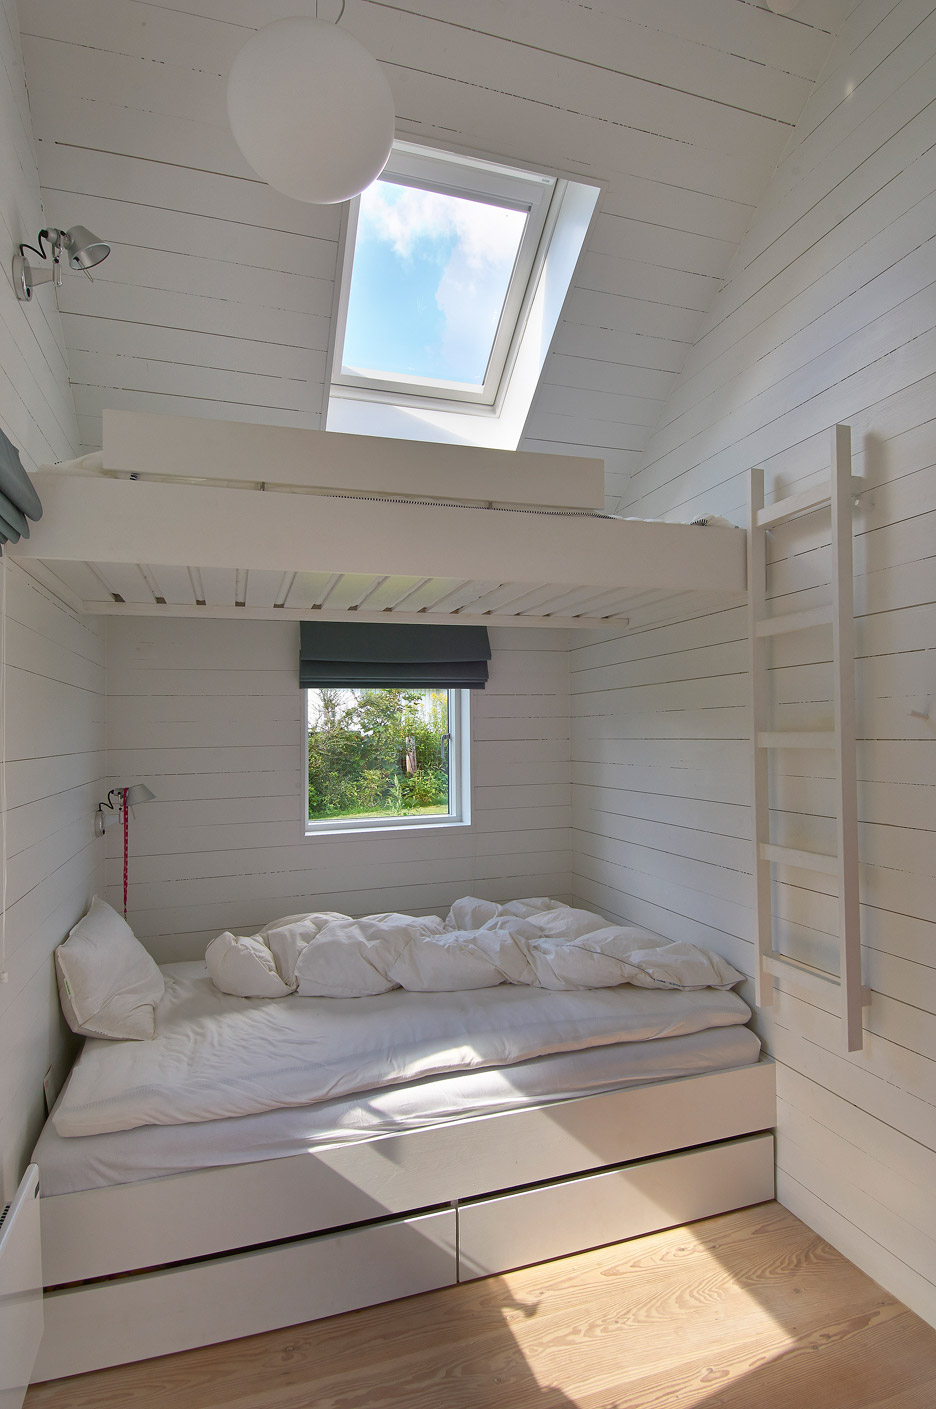 Summer house in denmark by jarmund vigsnæs arkitekter